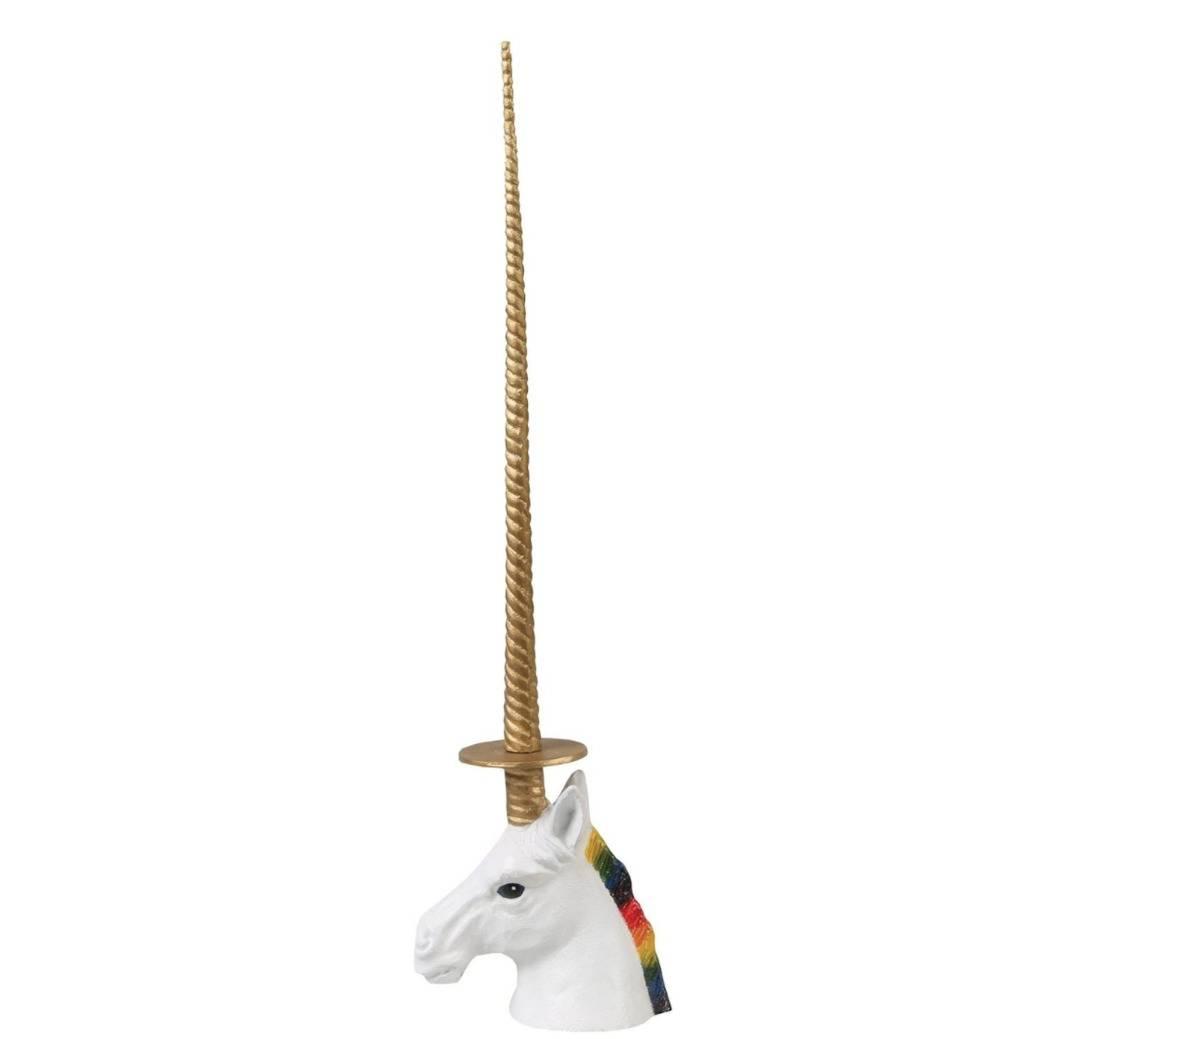 a unicorn paper towel holder